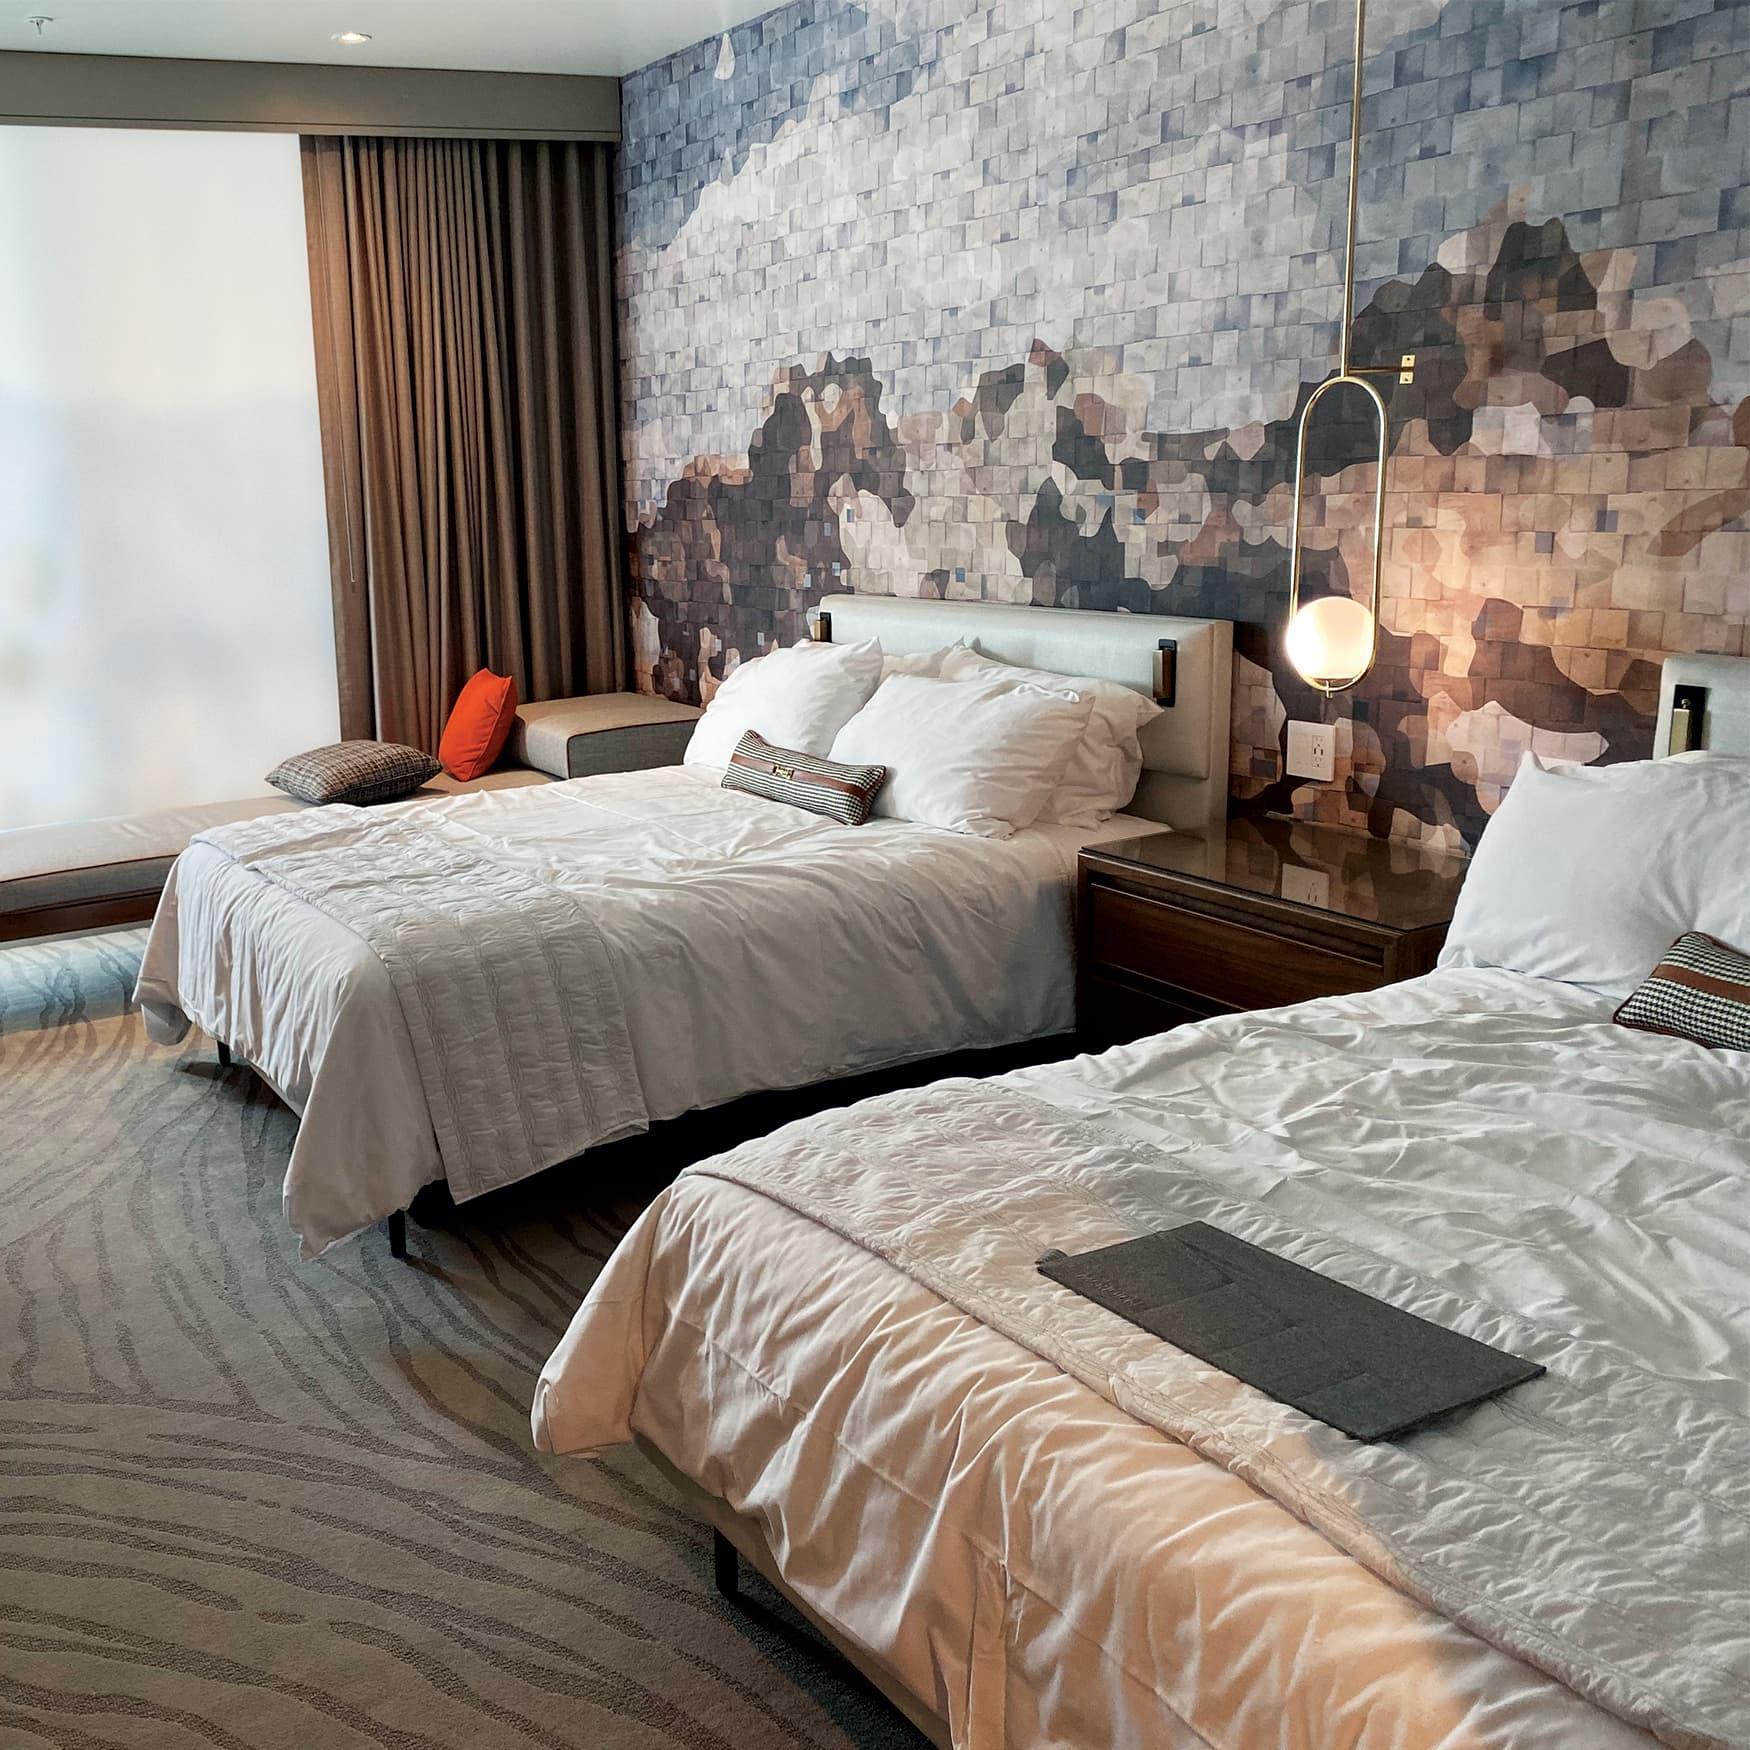 Hospitality Room Design for Le Meridien by RSM Design